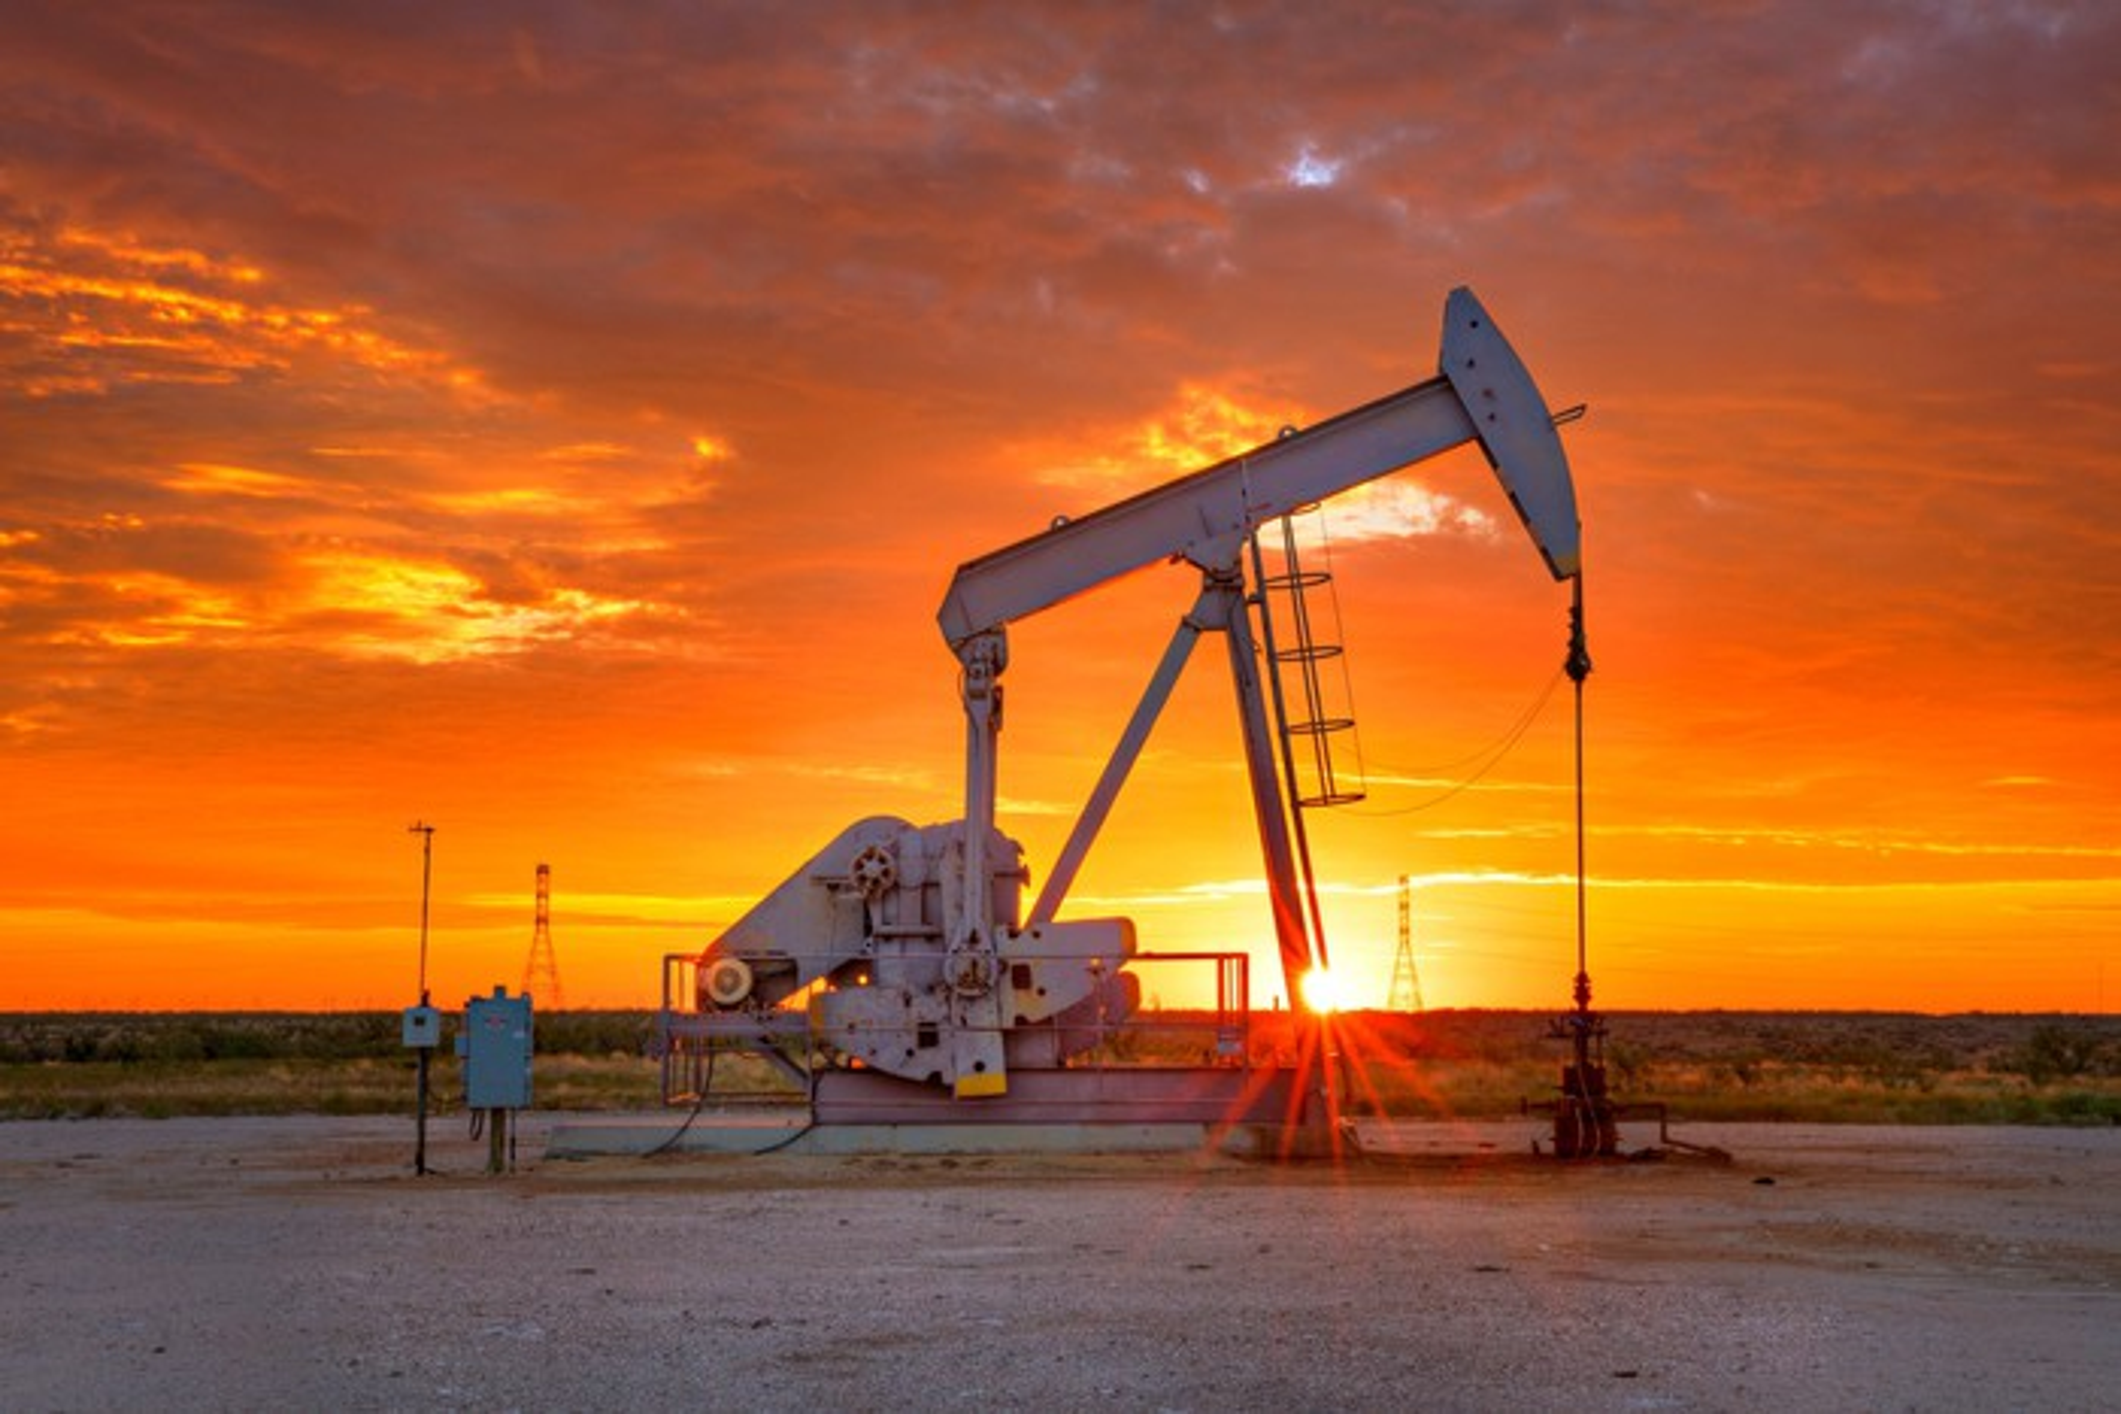 Oil pump during a beautiful golden sunrise.